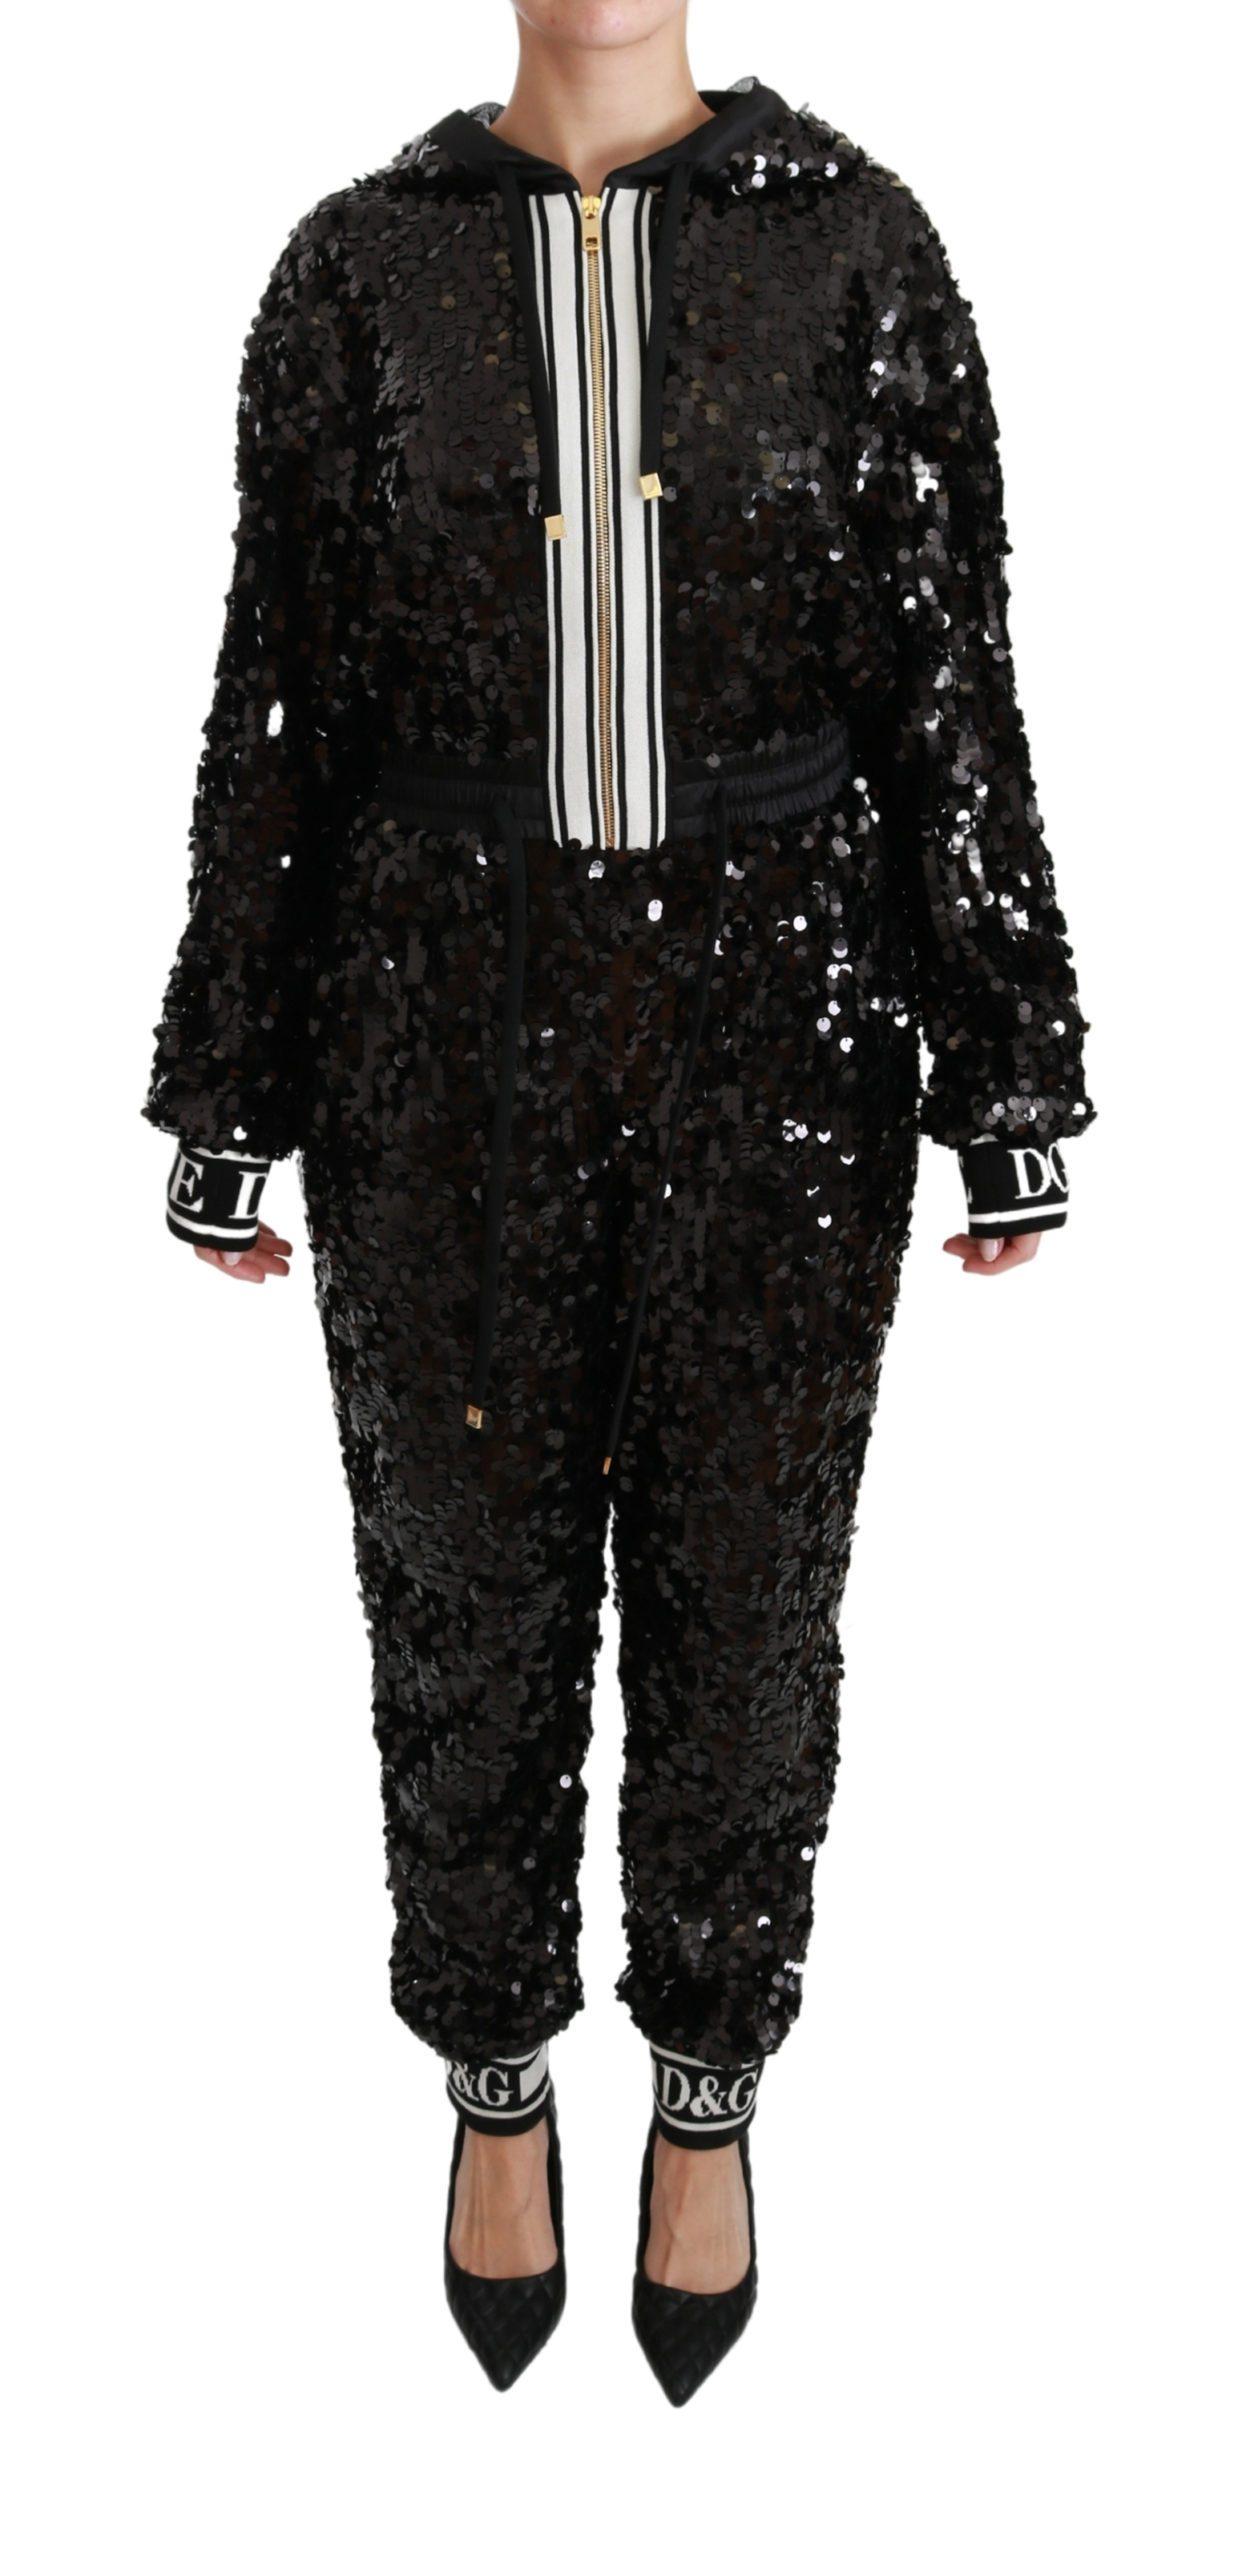 Dolce & Gabbana Women's Sequined Hooded Dress Black DR2486 - IT36 | XS